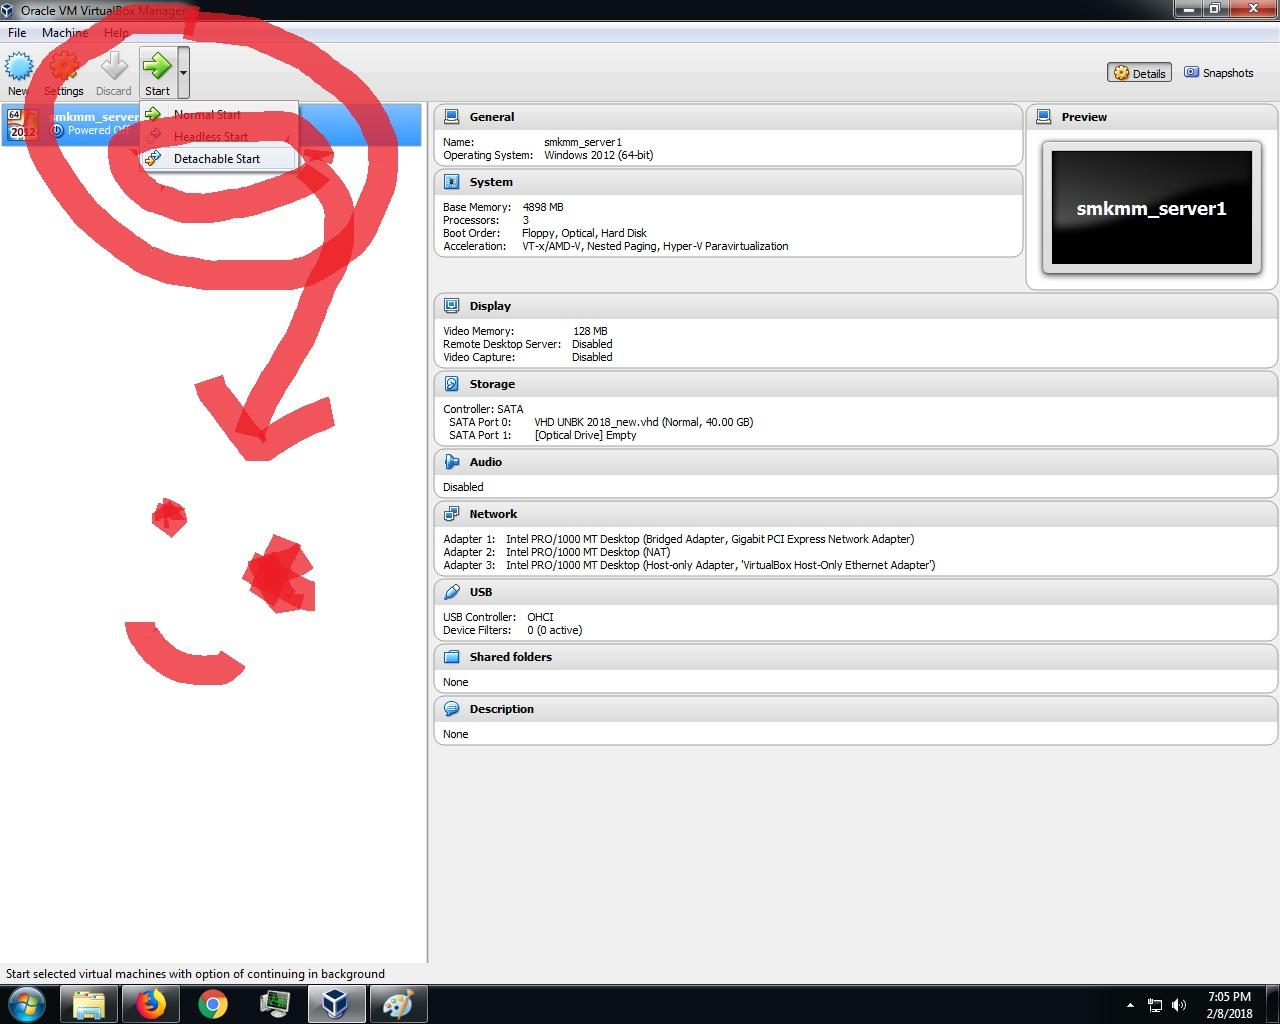 virtualbox detachable start